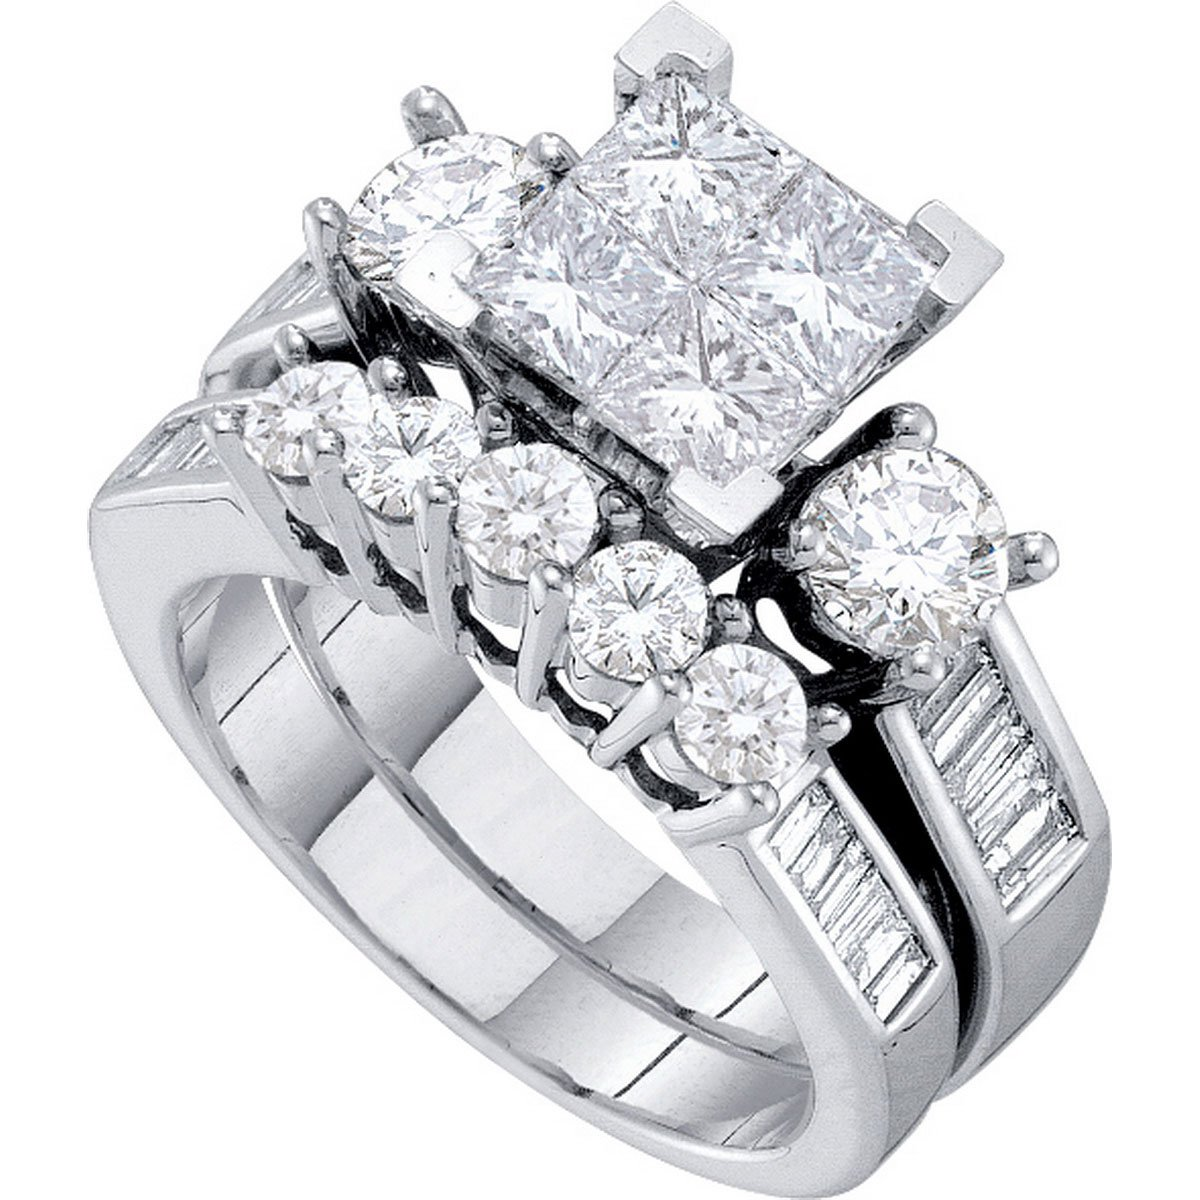 Diamond Princess Engagement Ring & Wedding Band Set Solid 14k White Gold Bridal Illusion Style 2.00 ctw by GemApex